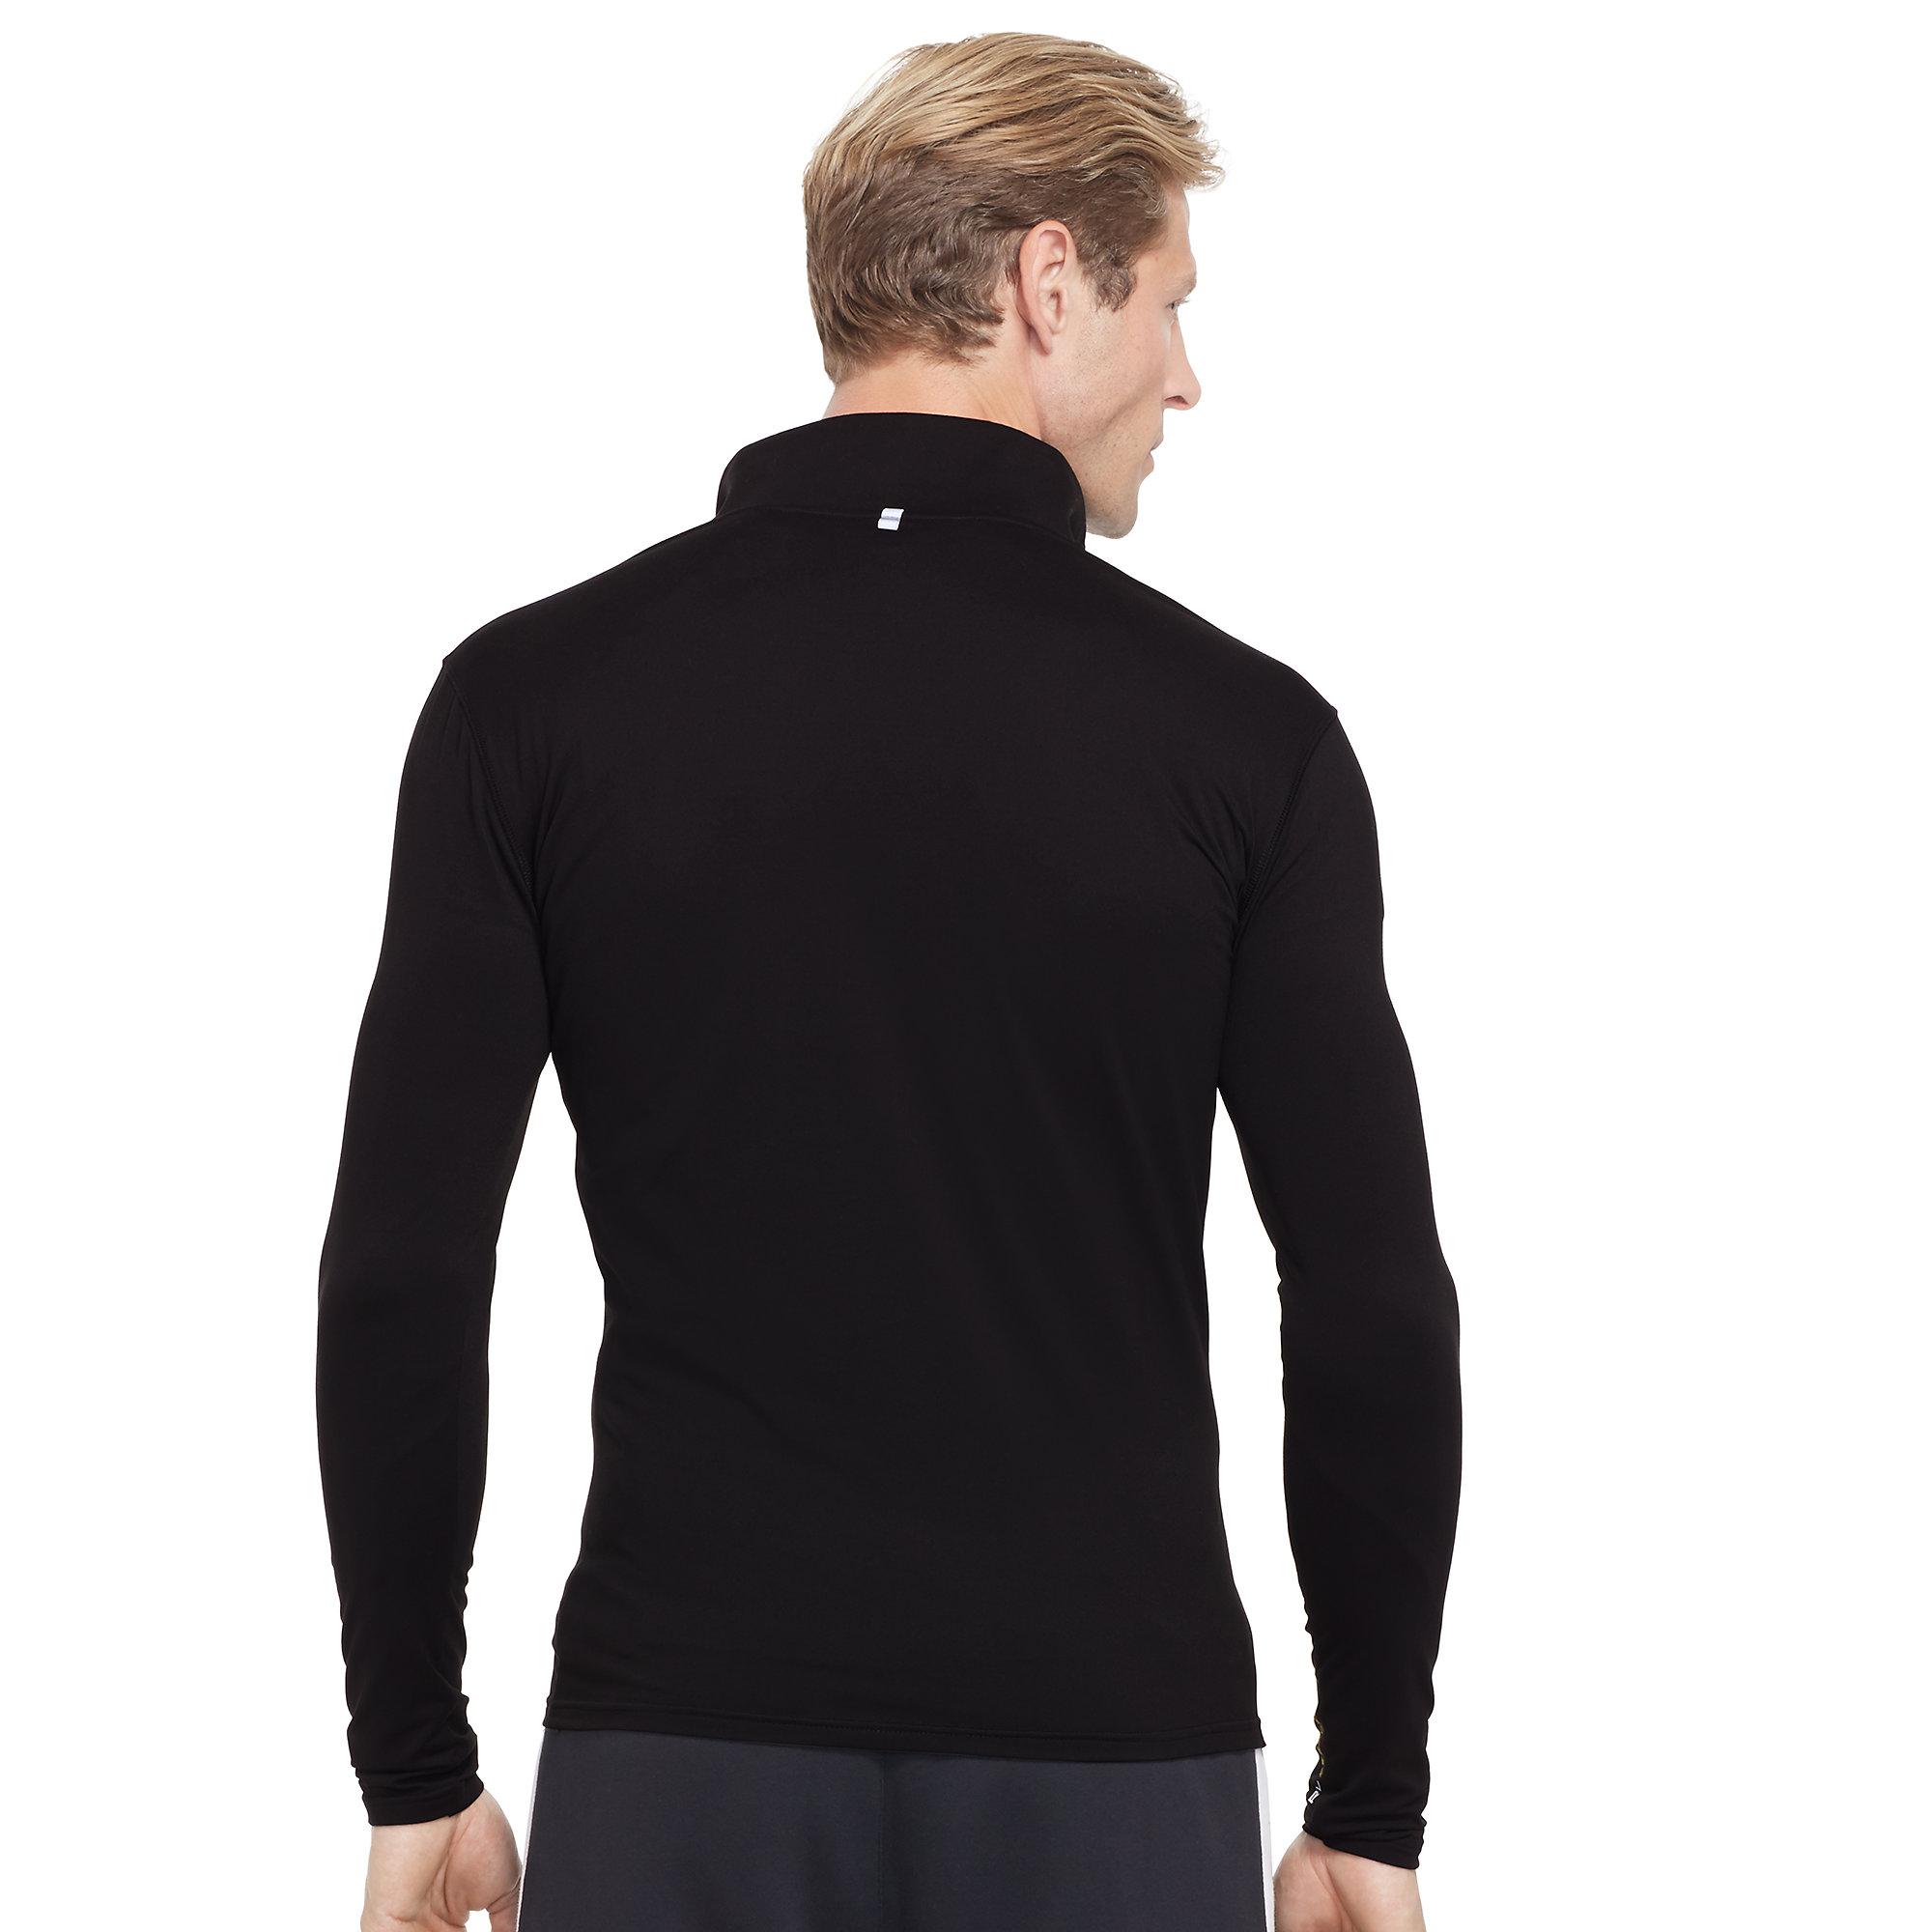 ralph lauren stretch jersey pullover in black for men polo black lyst. Black Bedroom Furniture Sets. Home Design Ideas